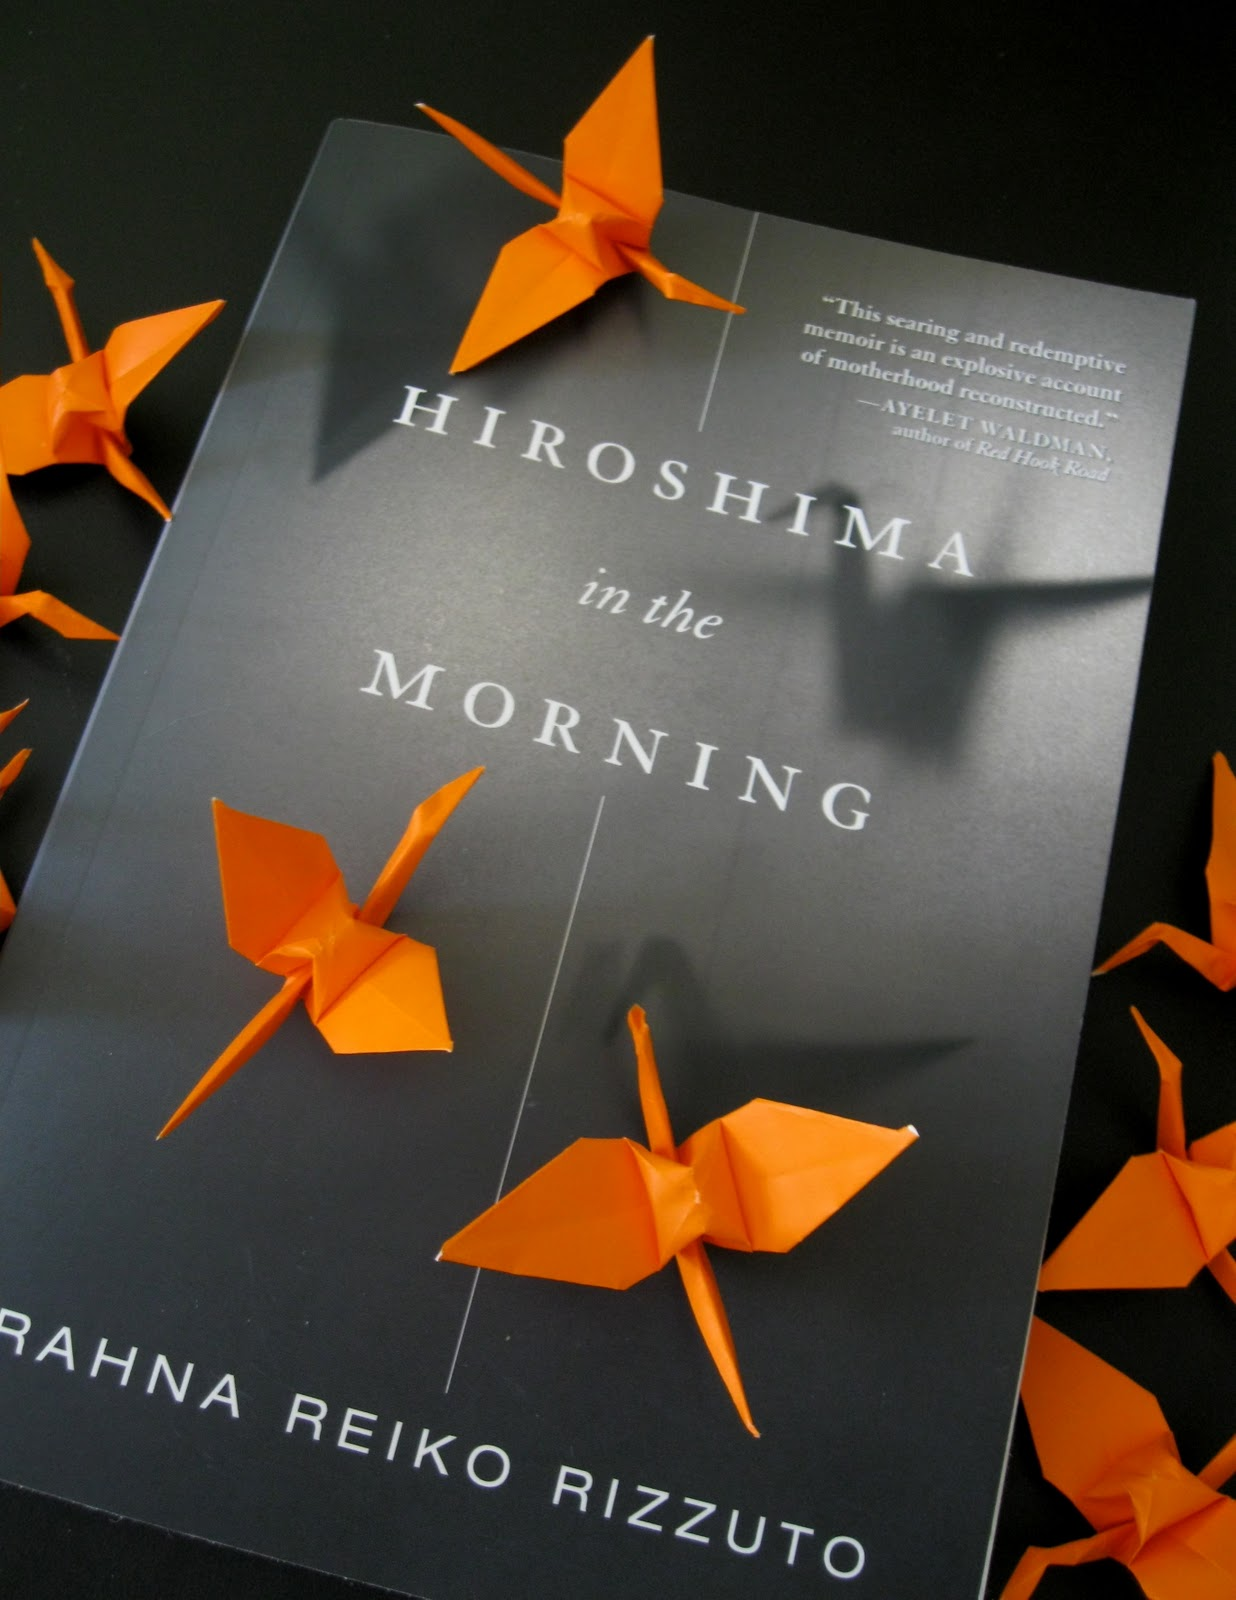 hiroshima in the morning rizzuto rahna reiko